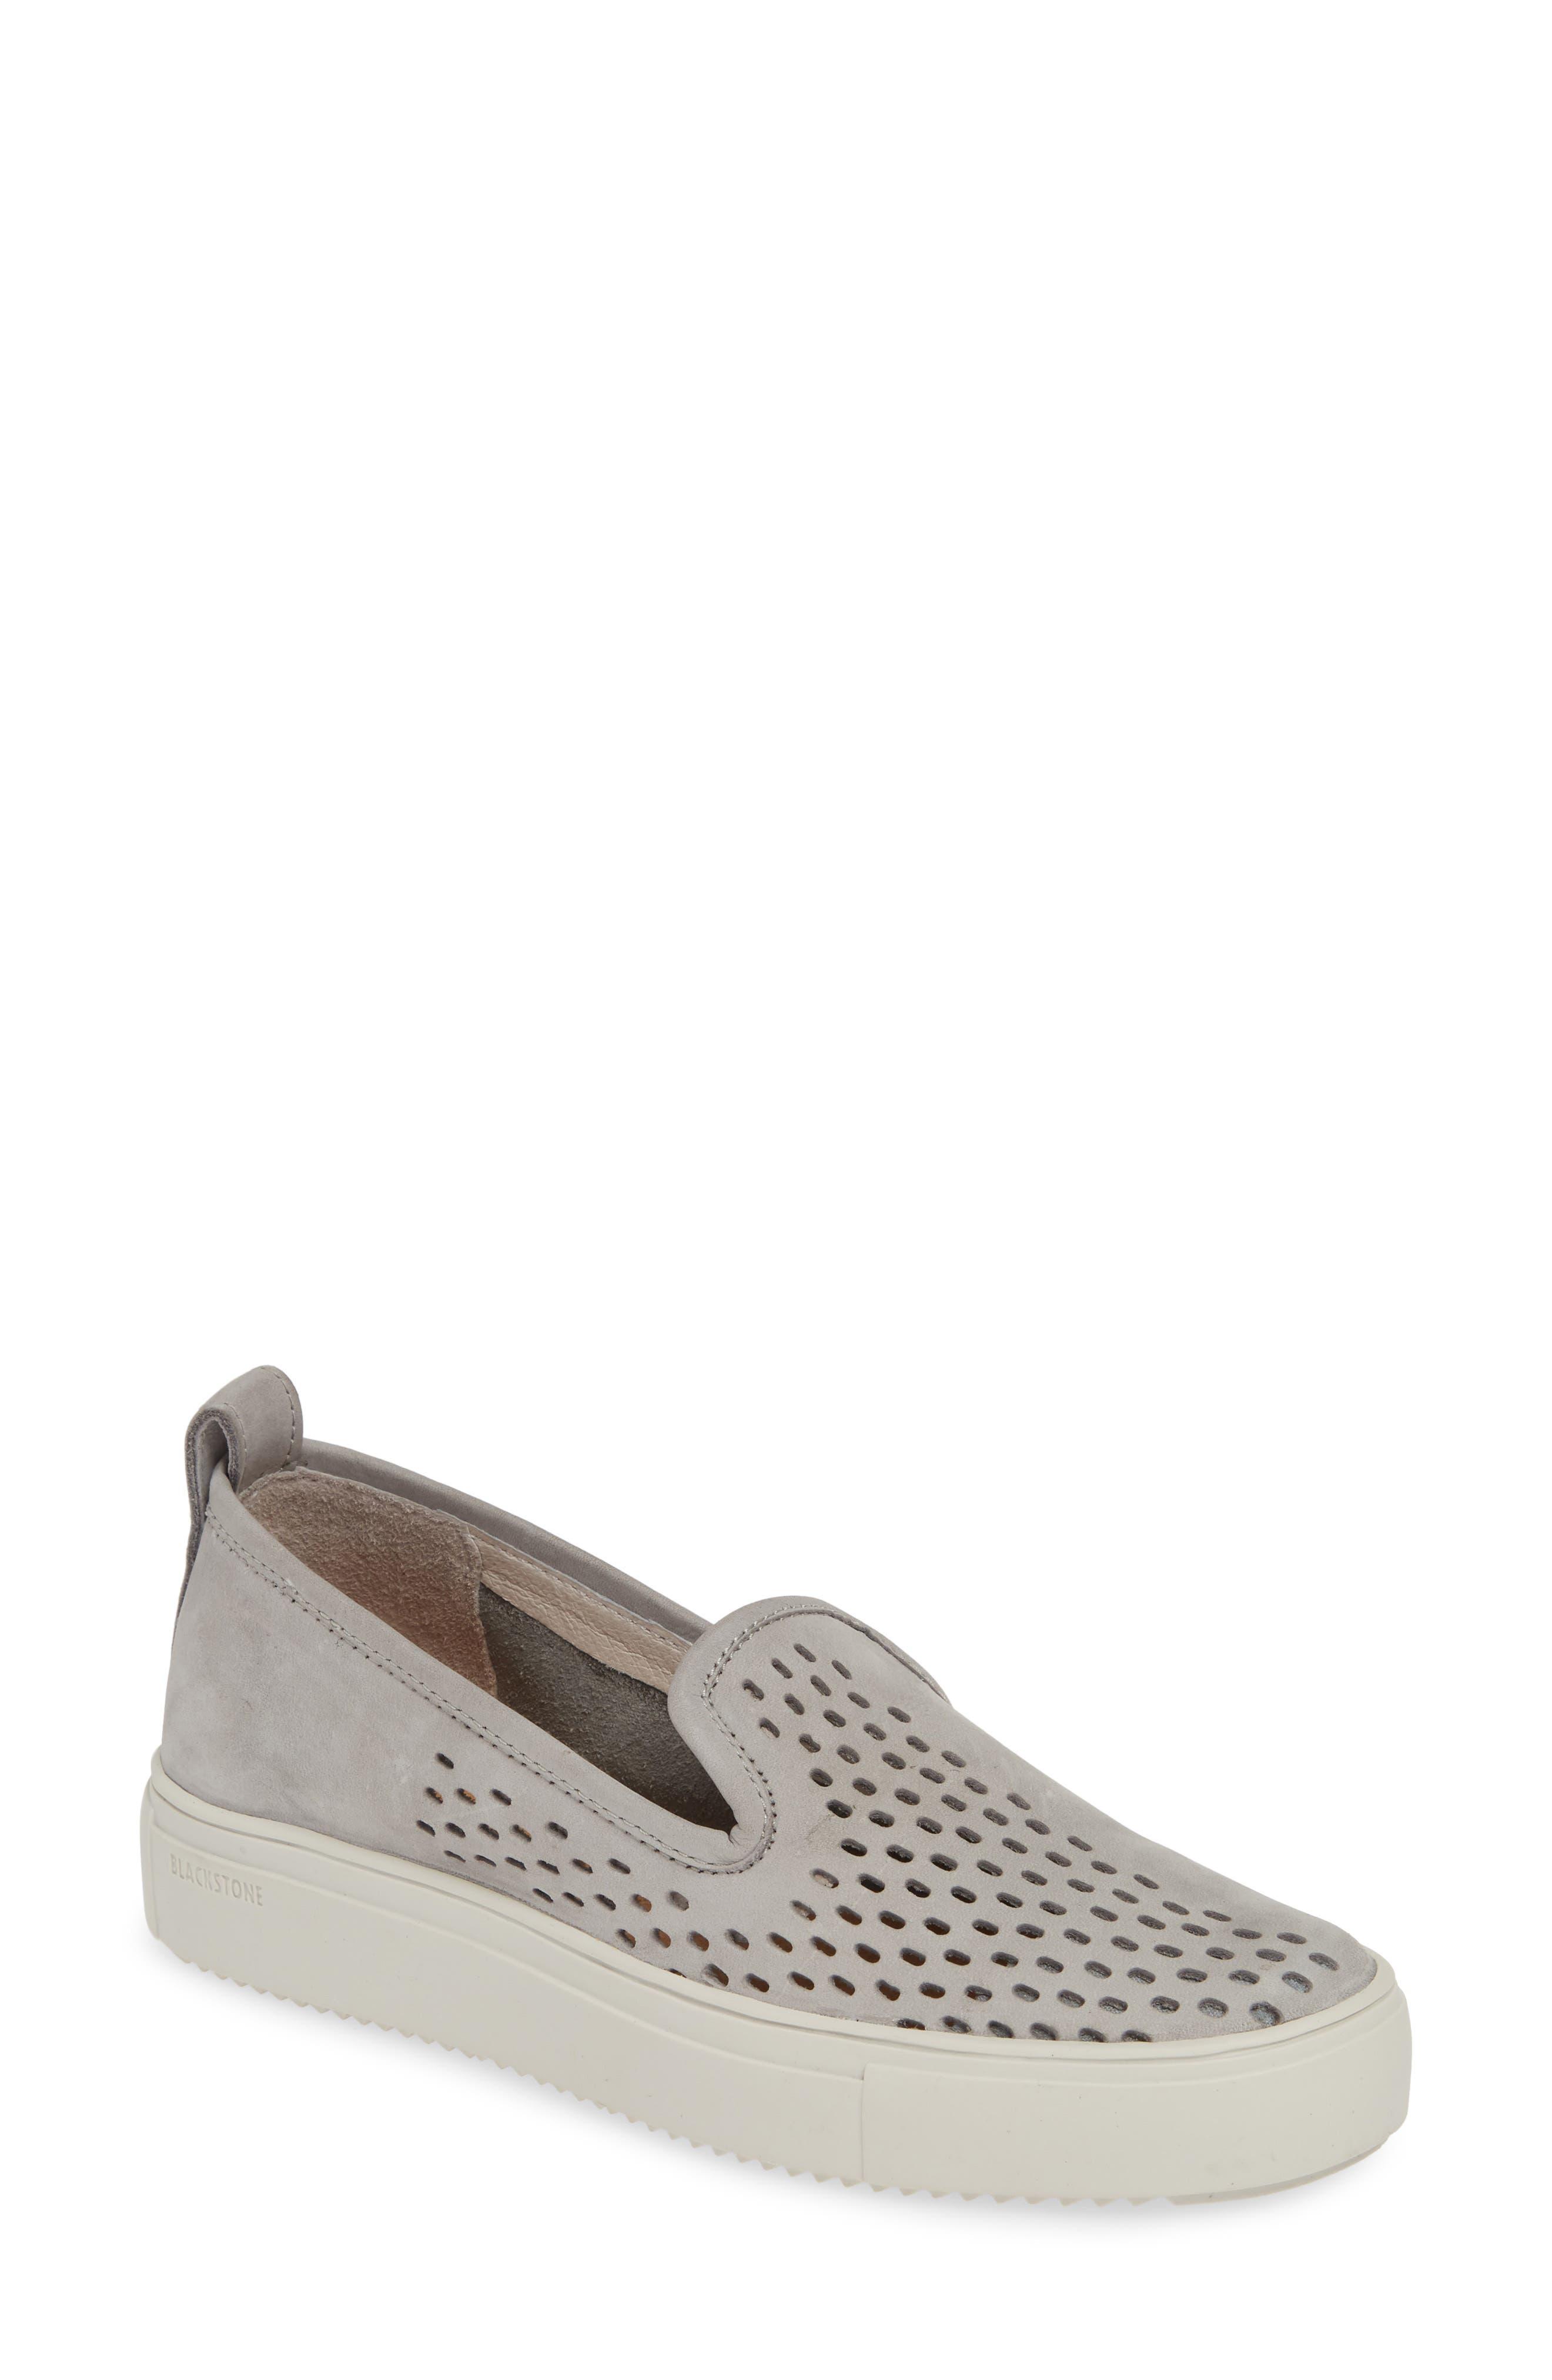 Blackstone Rl68 Perforated Slip-On Sneaker, Metallic